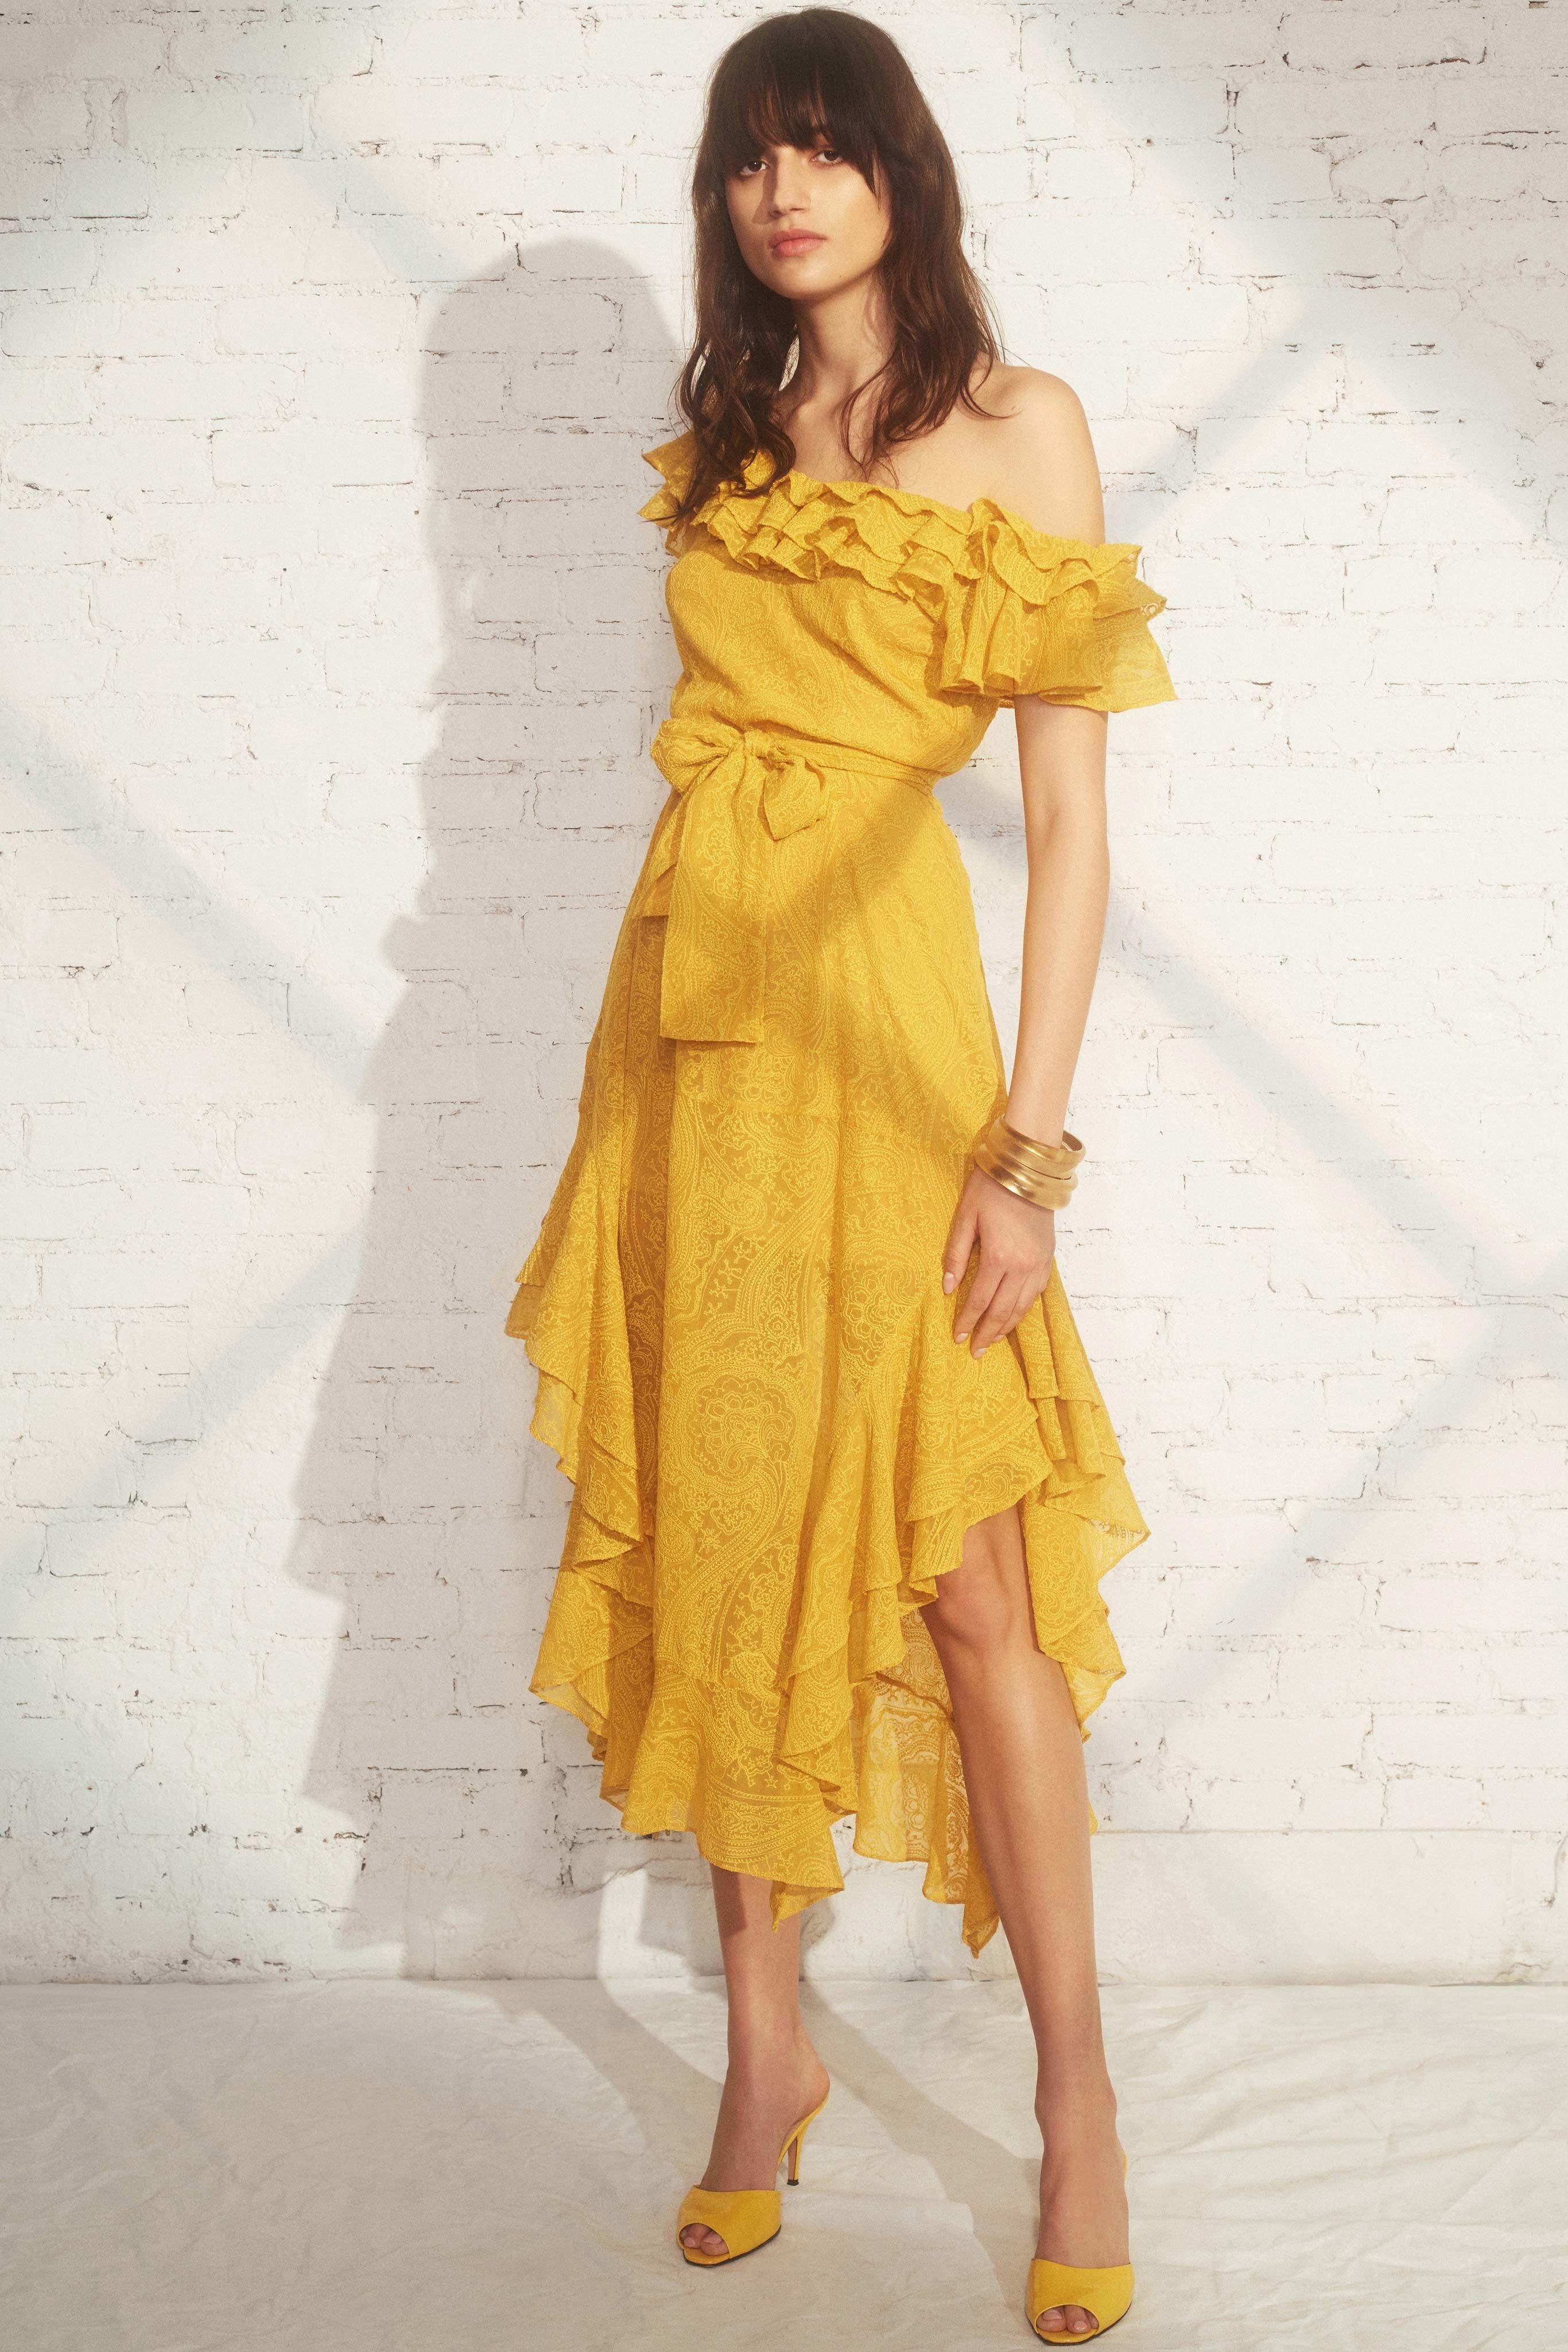 893b5e032f81f7 Marissa Webb Resort 2019 Collection - Vogue purveyoroffinefabrics   rexfabrics  passionforfabrics